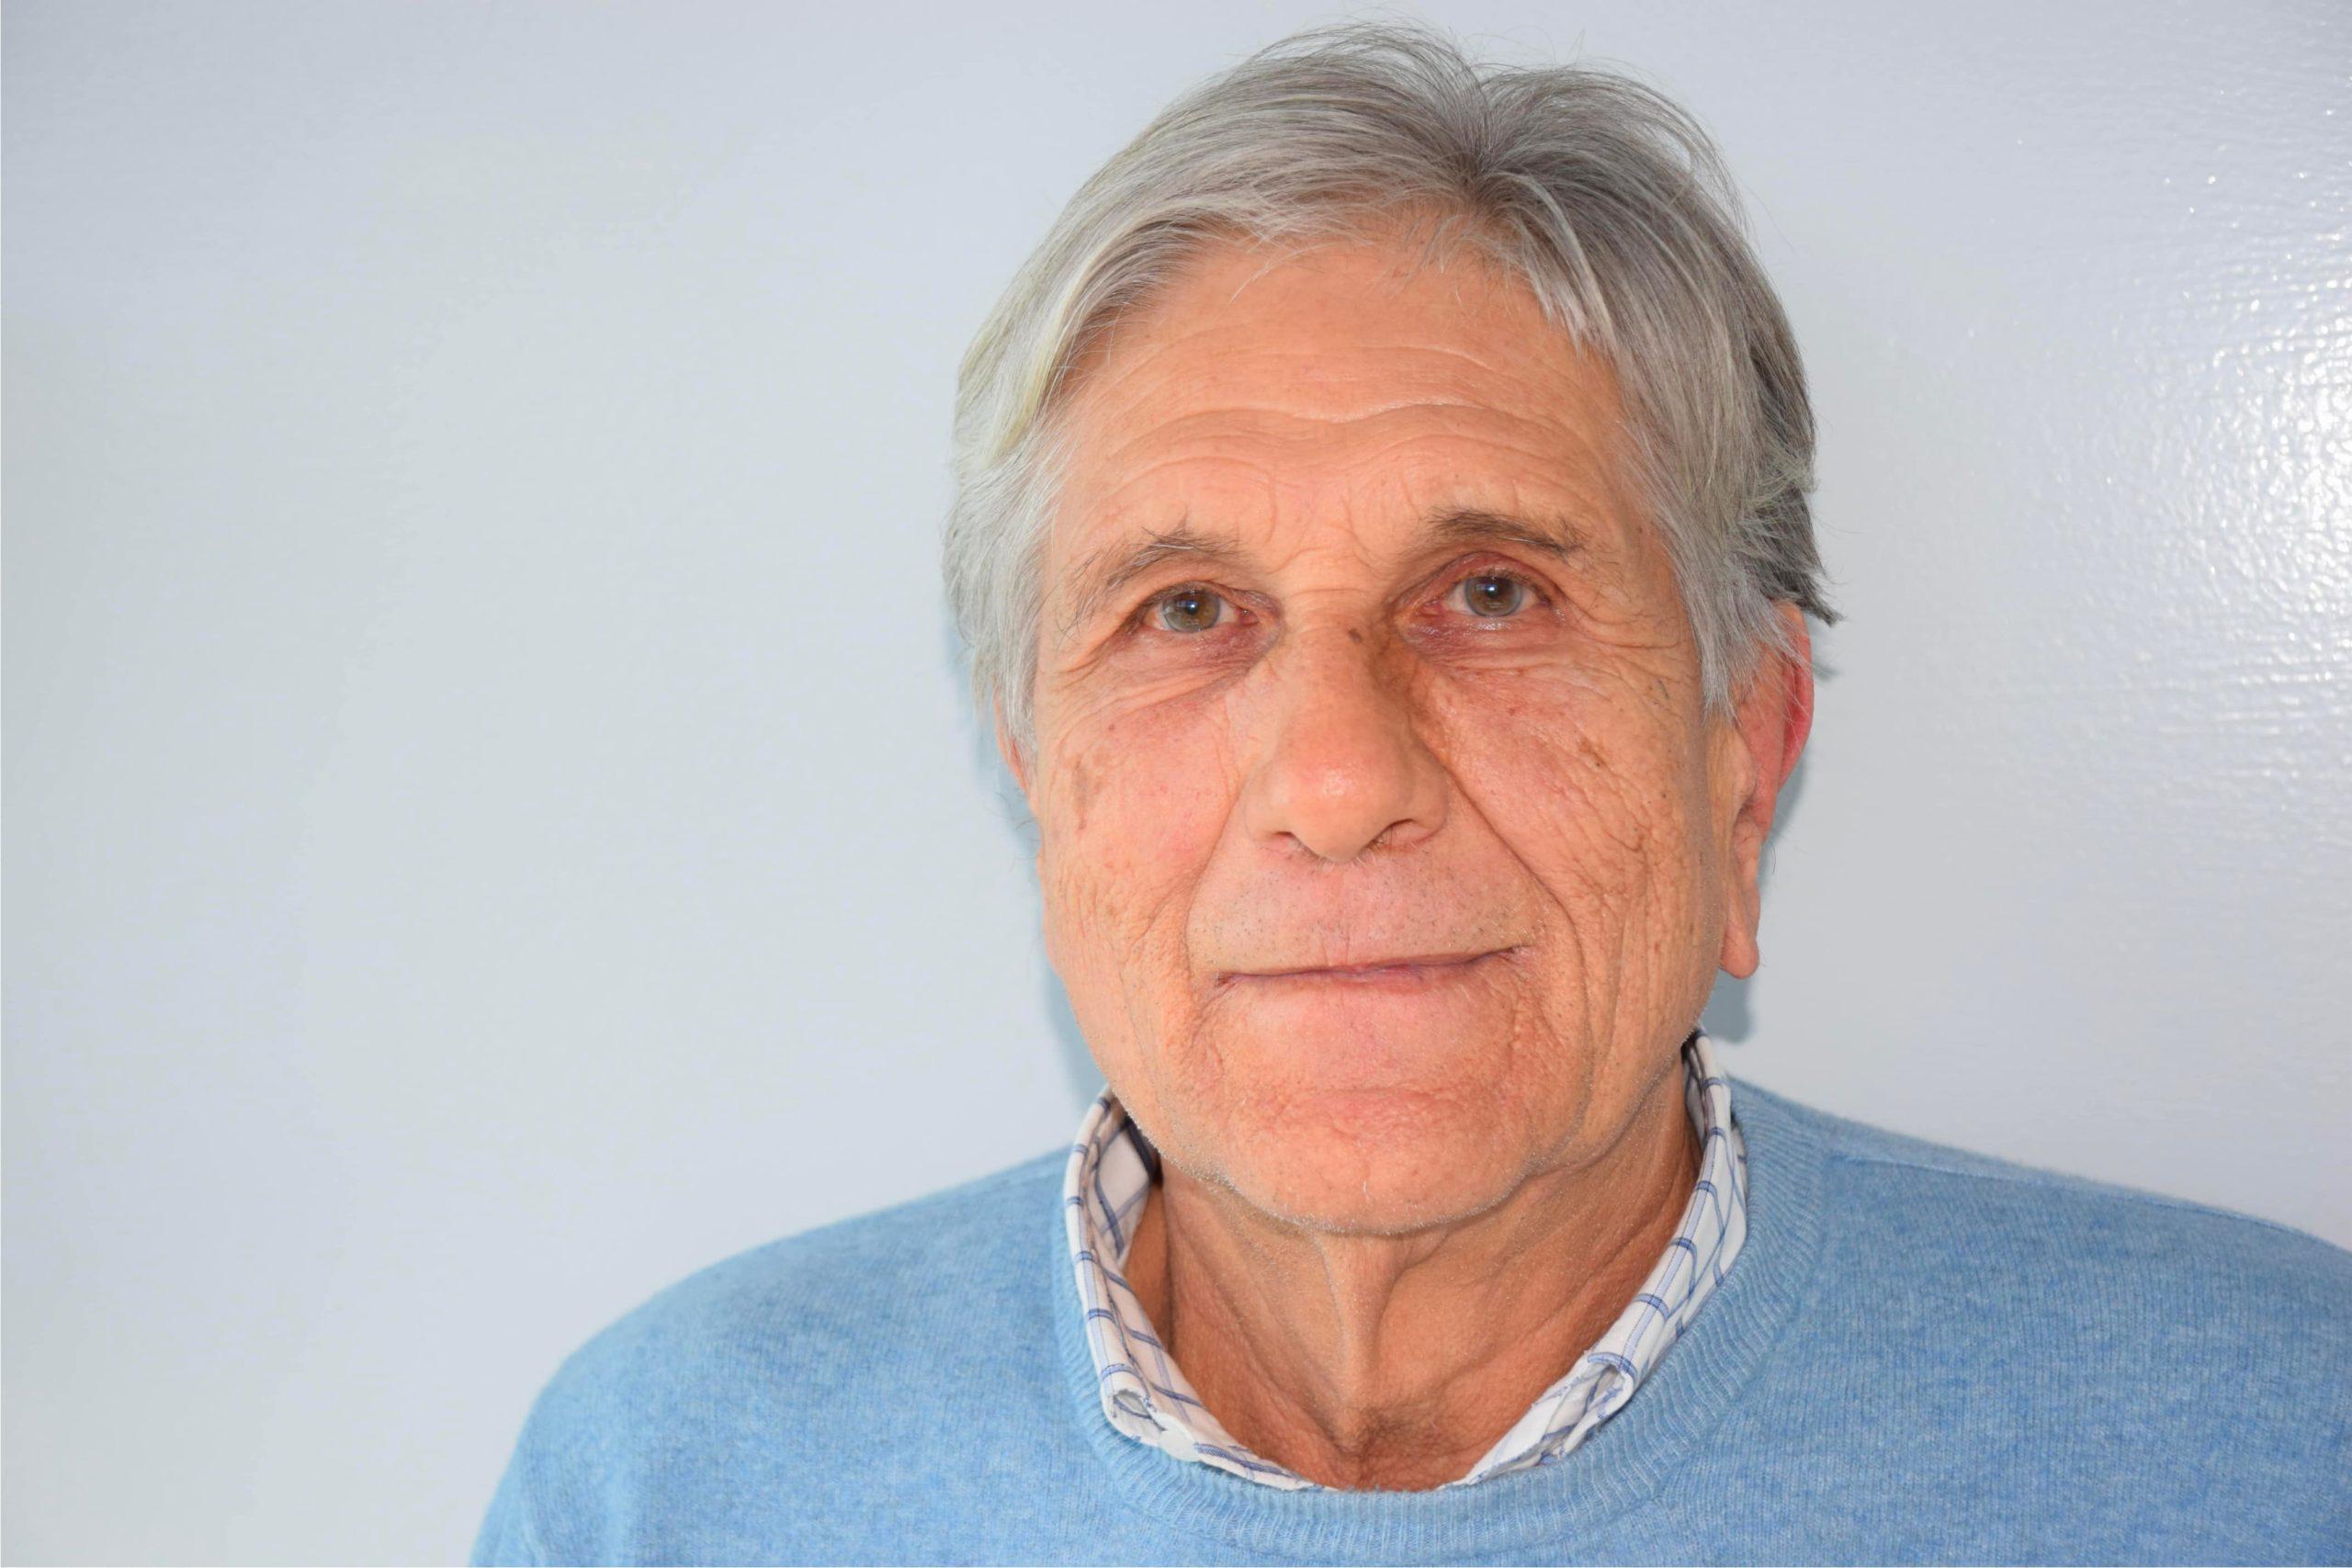 Dott. Eugenio Rampinelli - medico chirurgo DIRETTORE SANITARIO